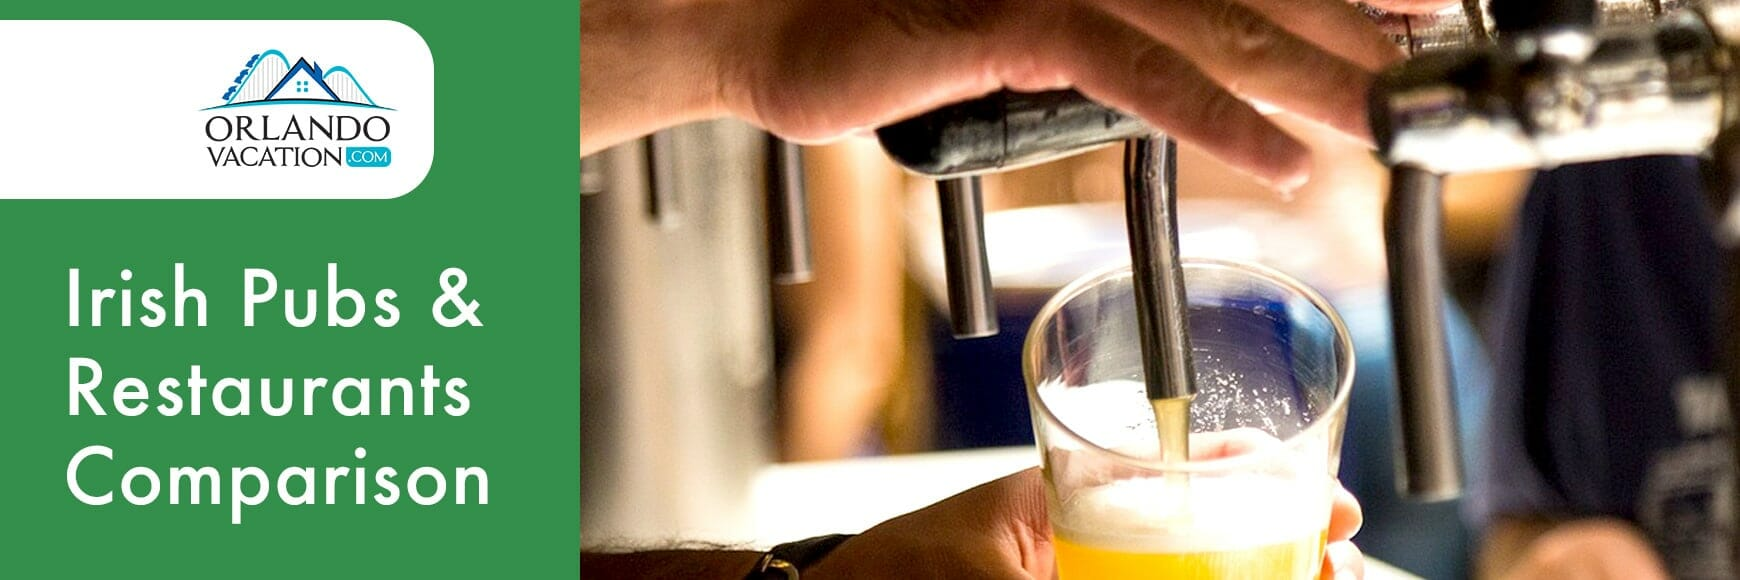 Irish Pubs and Restaurants Comparison